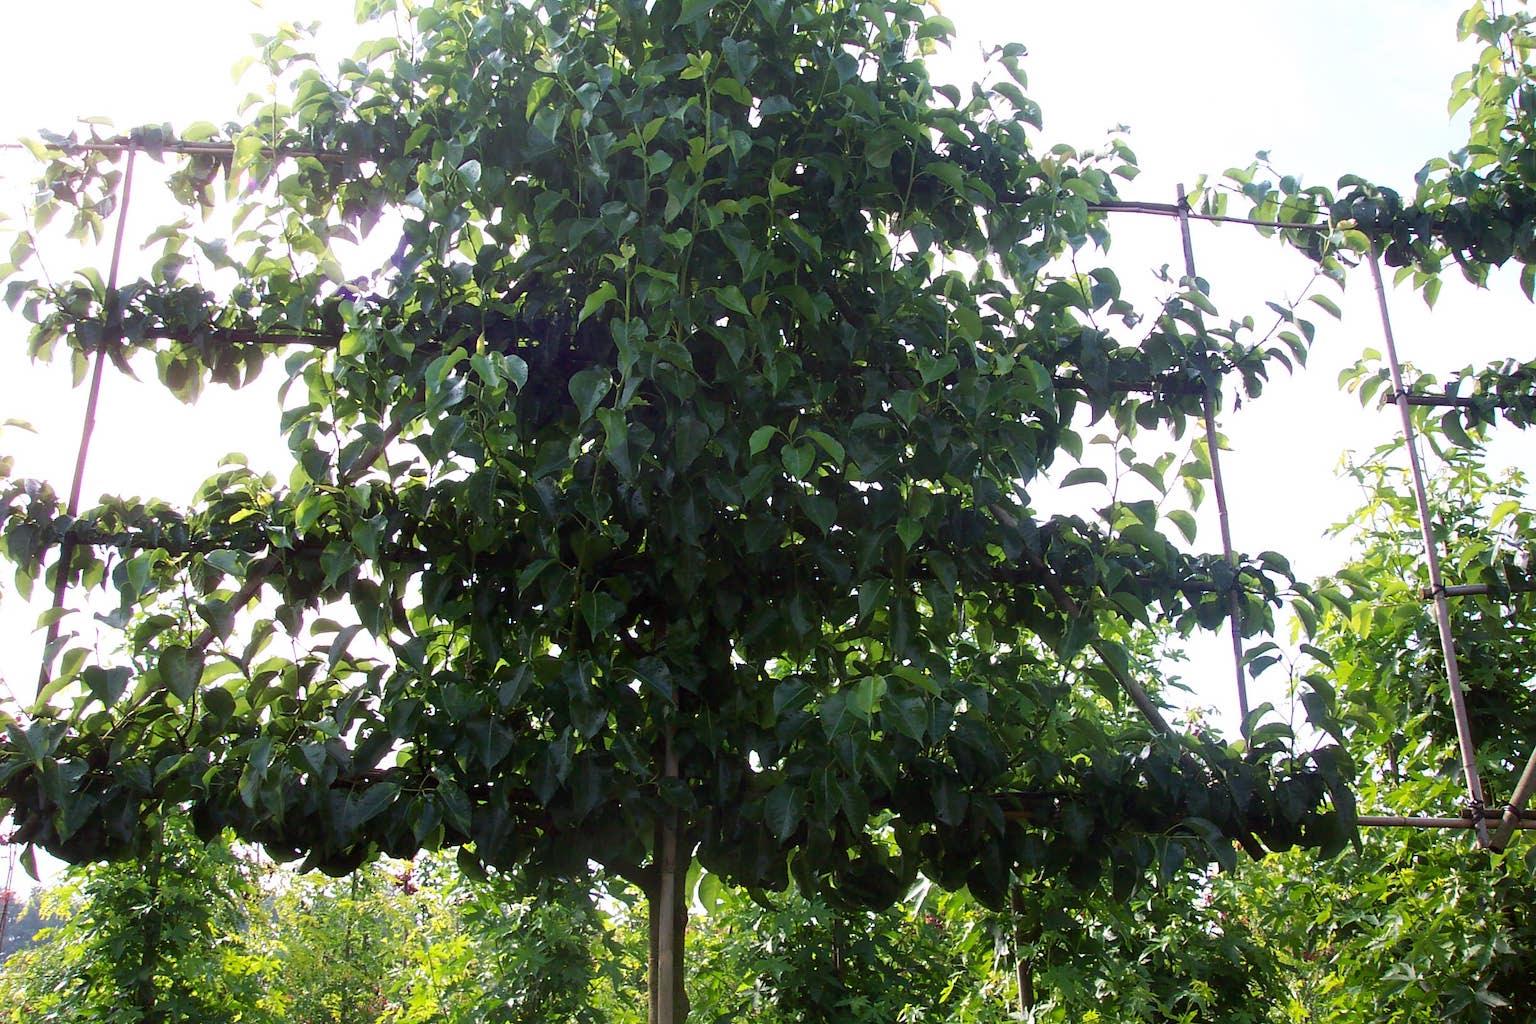 Pyrus calleryana 'Chanticleer' espalier pleached ornamental pear tree 18-20 grade